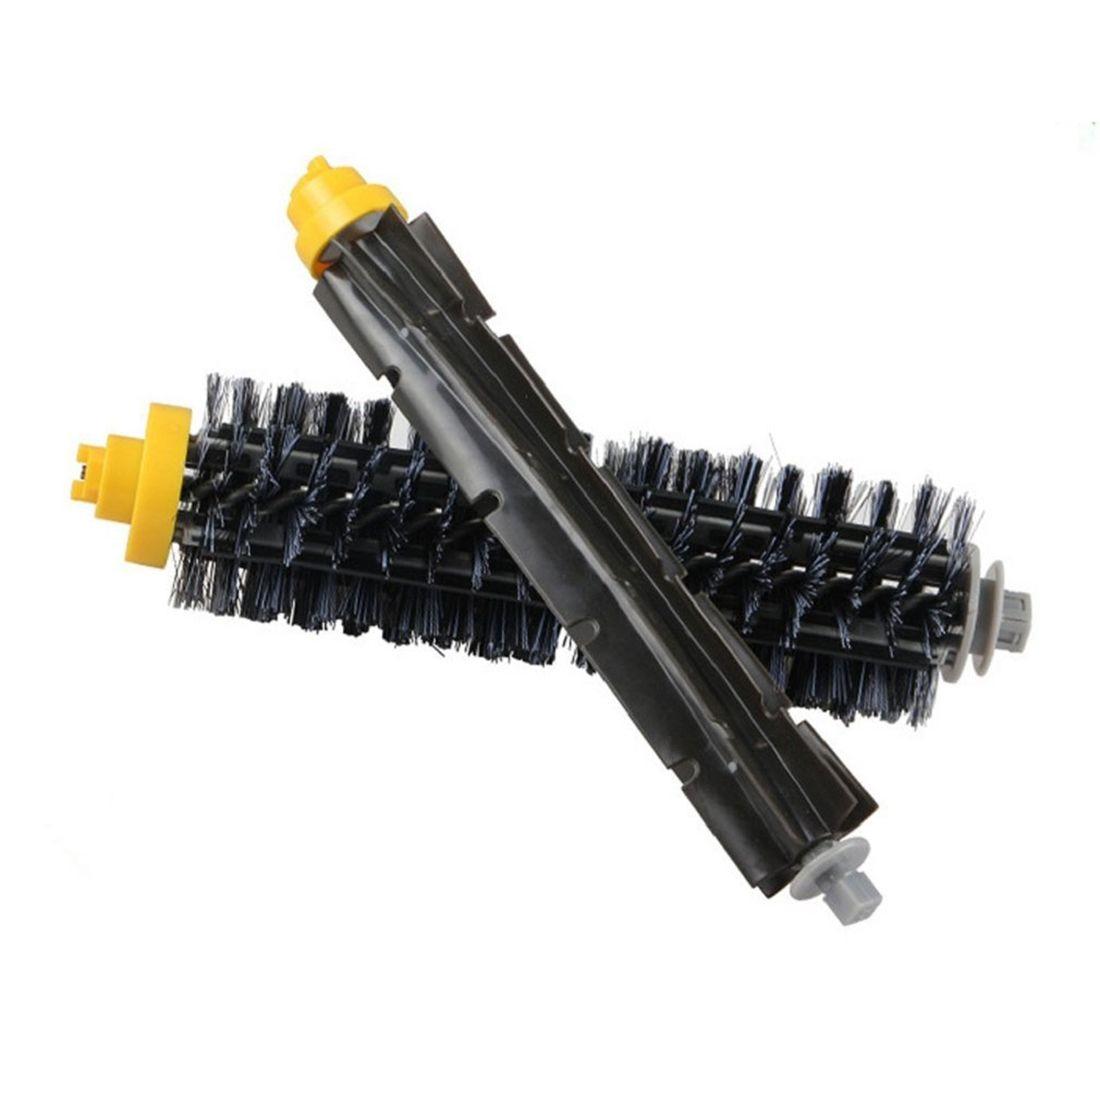 1pair Brush High Quality Parts for vacuum cleaner iRobot Roomba 600 630 650 700 Series 2017 new durable vacuum cleaner parts filter brush 6 piece tool kit for irobot roomba 600 series 620 630 650